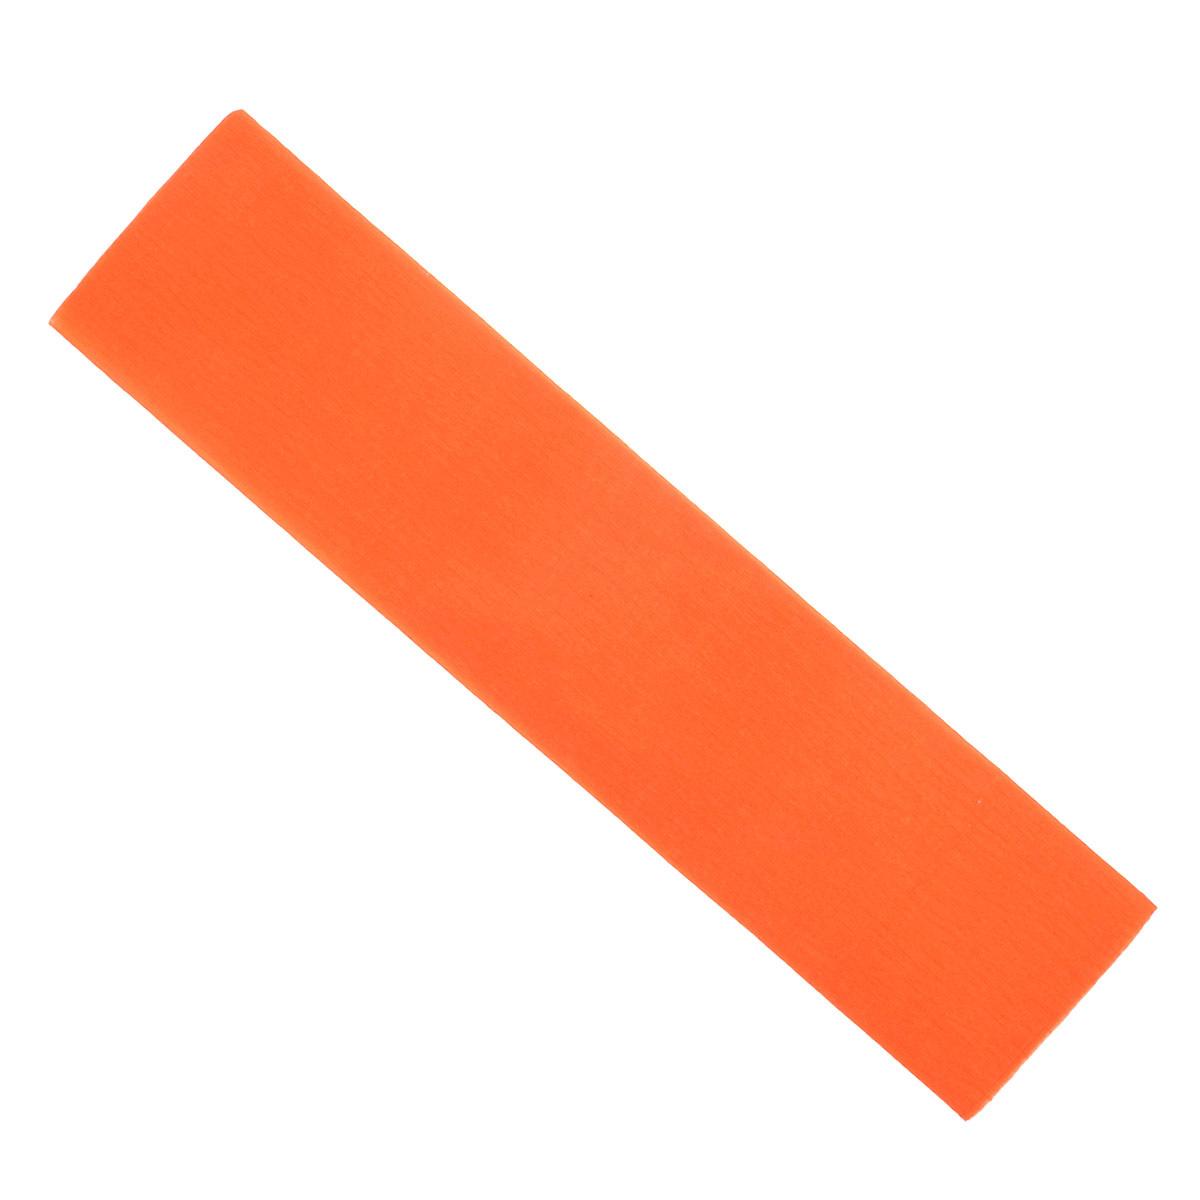 "Крепированная бумага ""Hatber"", флюоресцентная, цвет: оранжевый, 5 см х 25 см  #1"